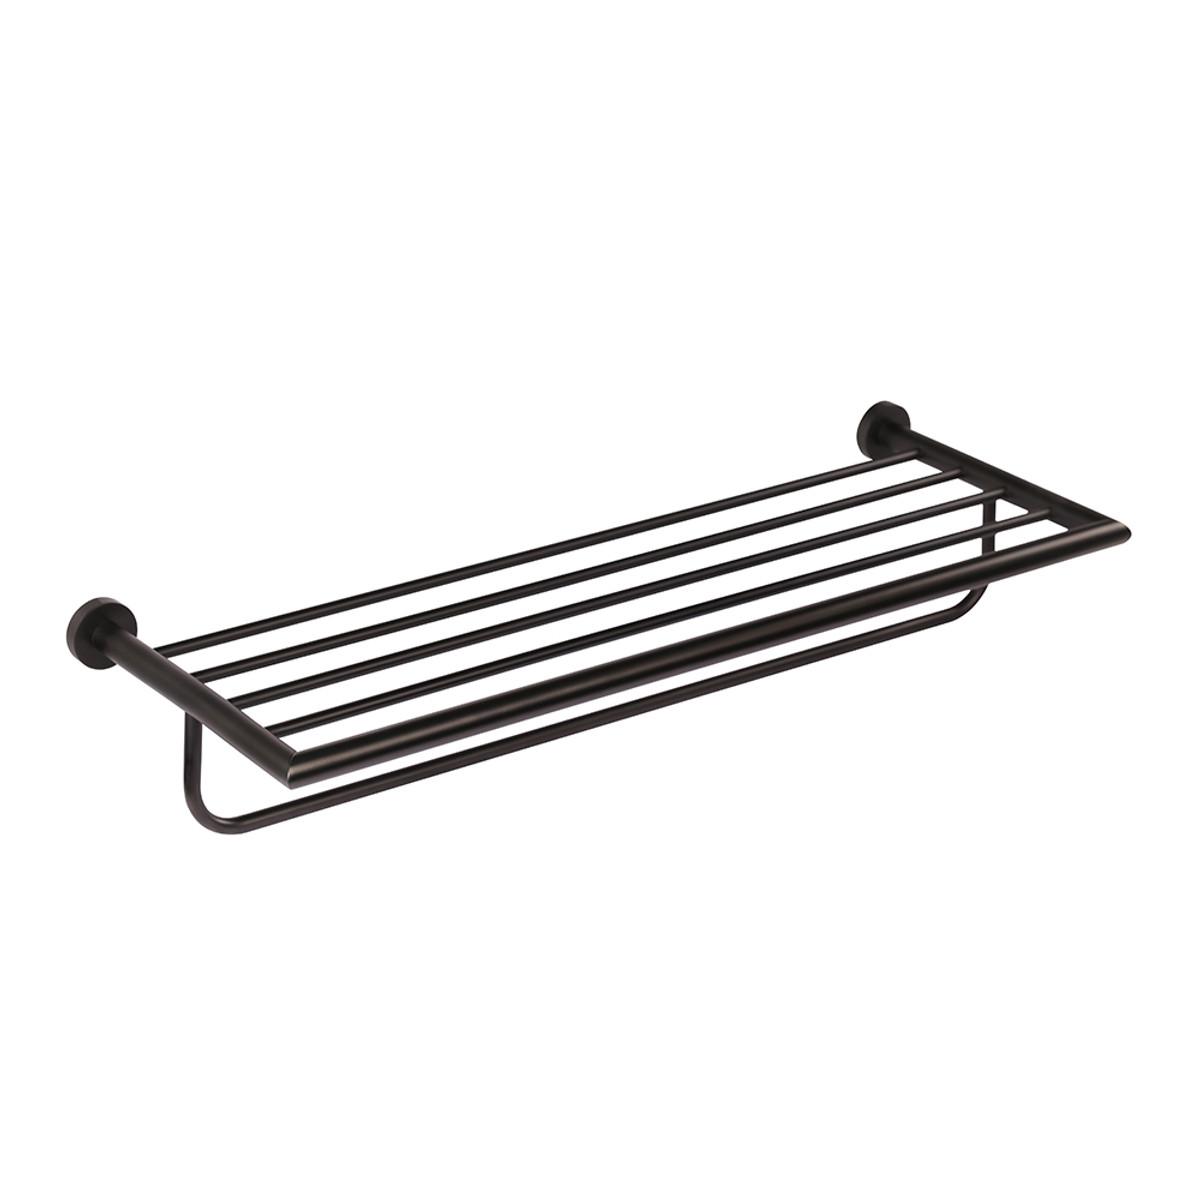 0204 Ronda Towel Shelf